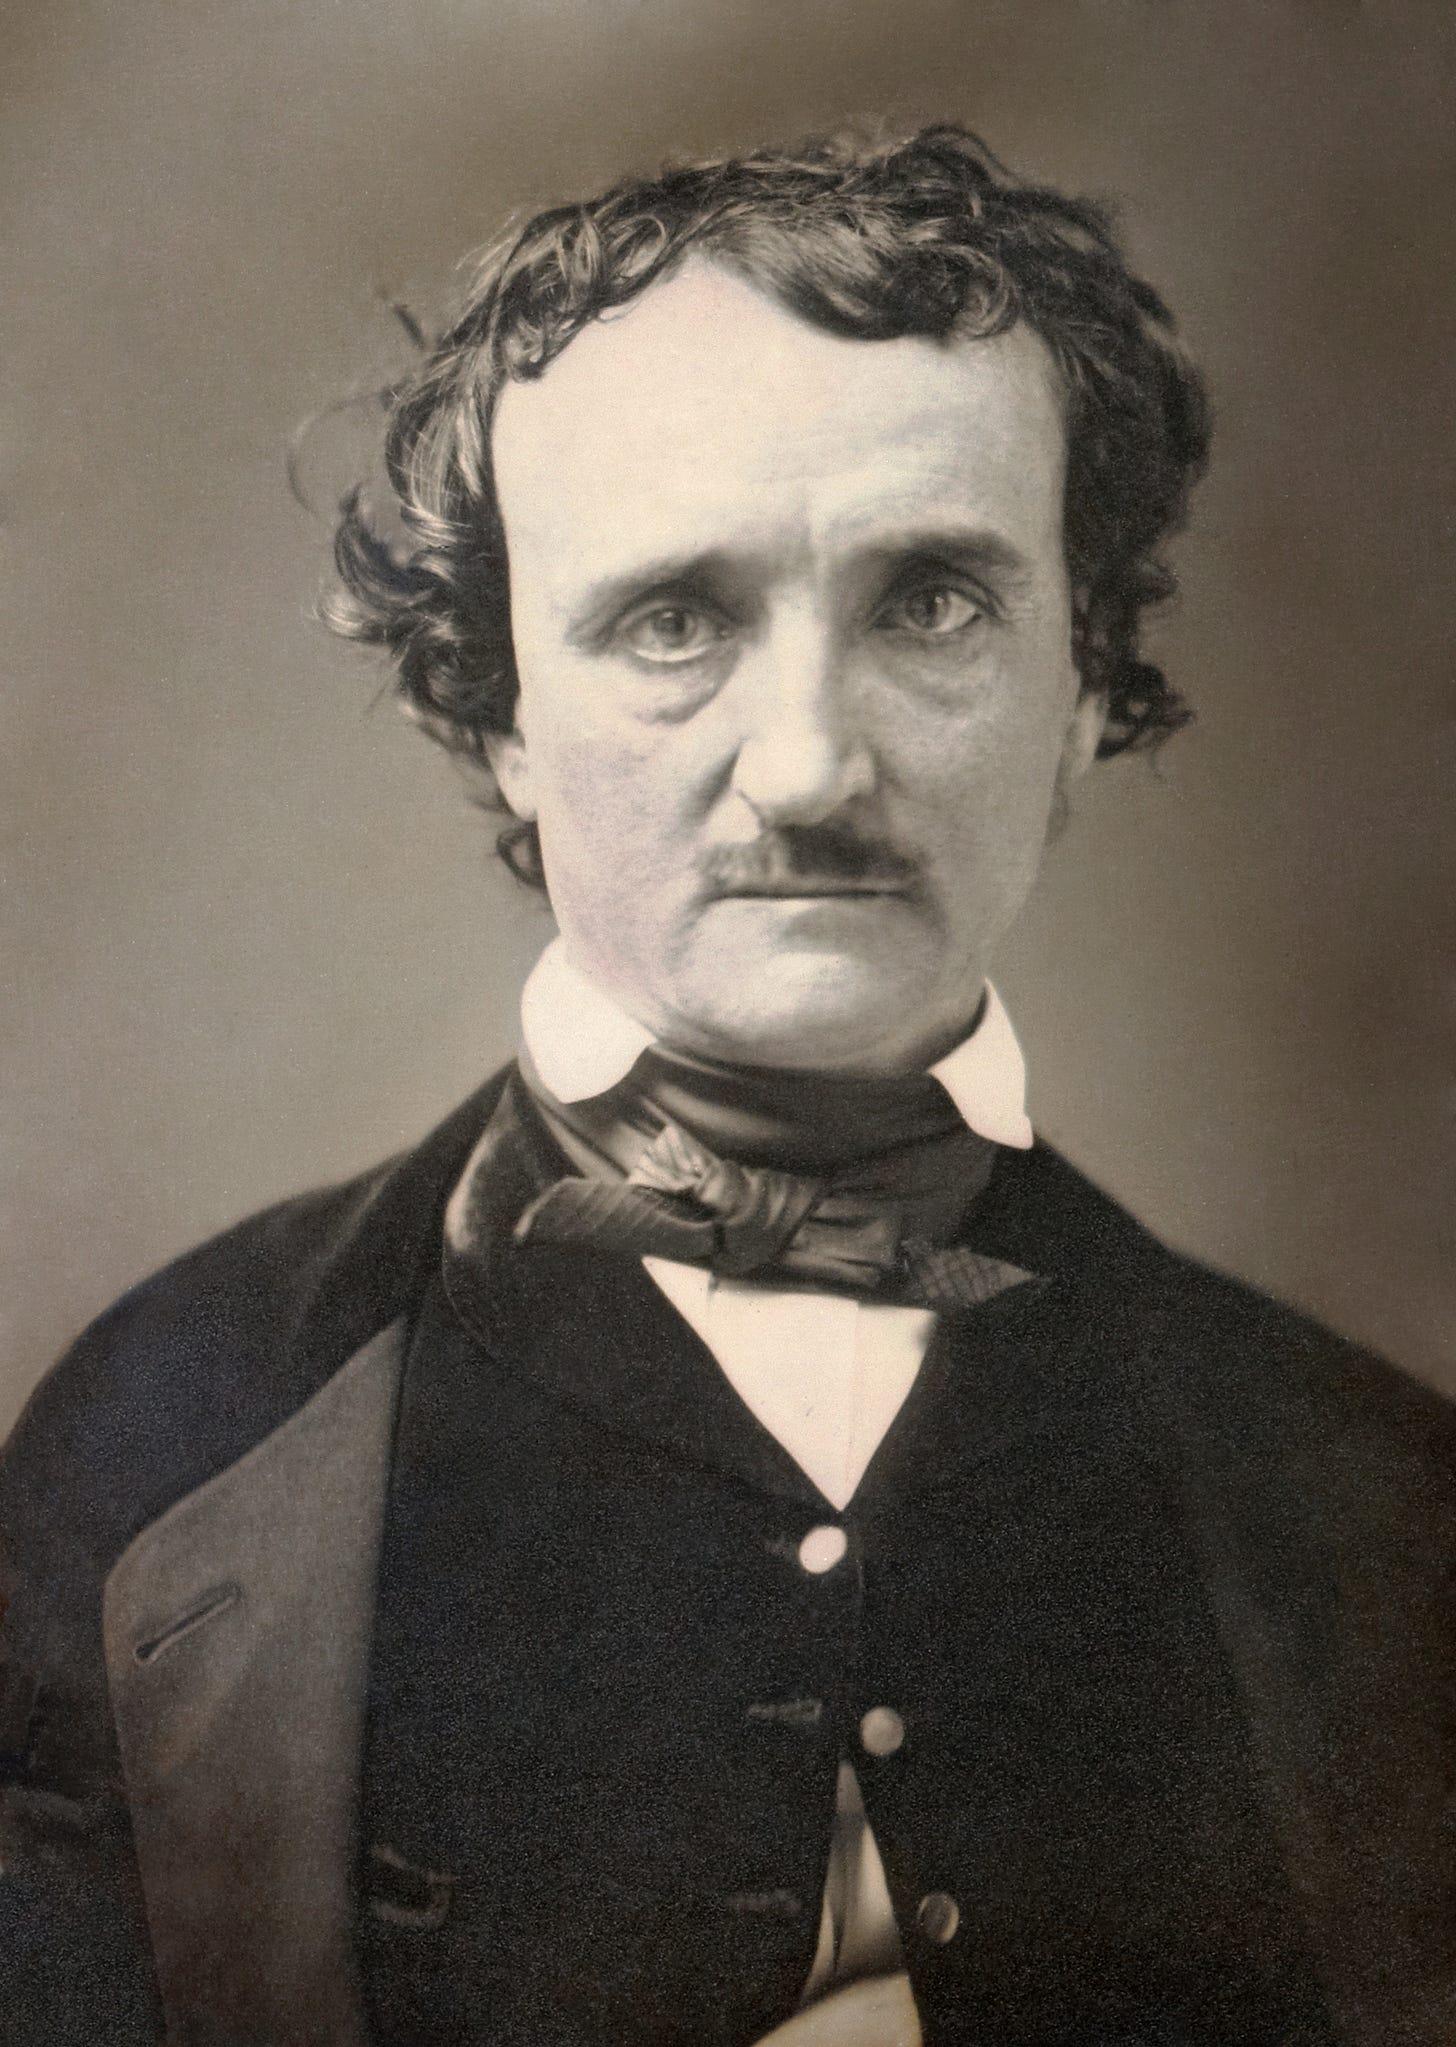 https://upload.wikimedia.org/wikipedia/commons/9/97/Edgar_Allan_Poe%2C_circa_1849%2C_restored%2C_squared_off.jpg